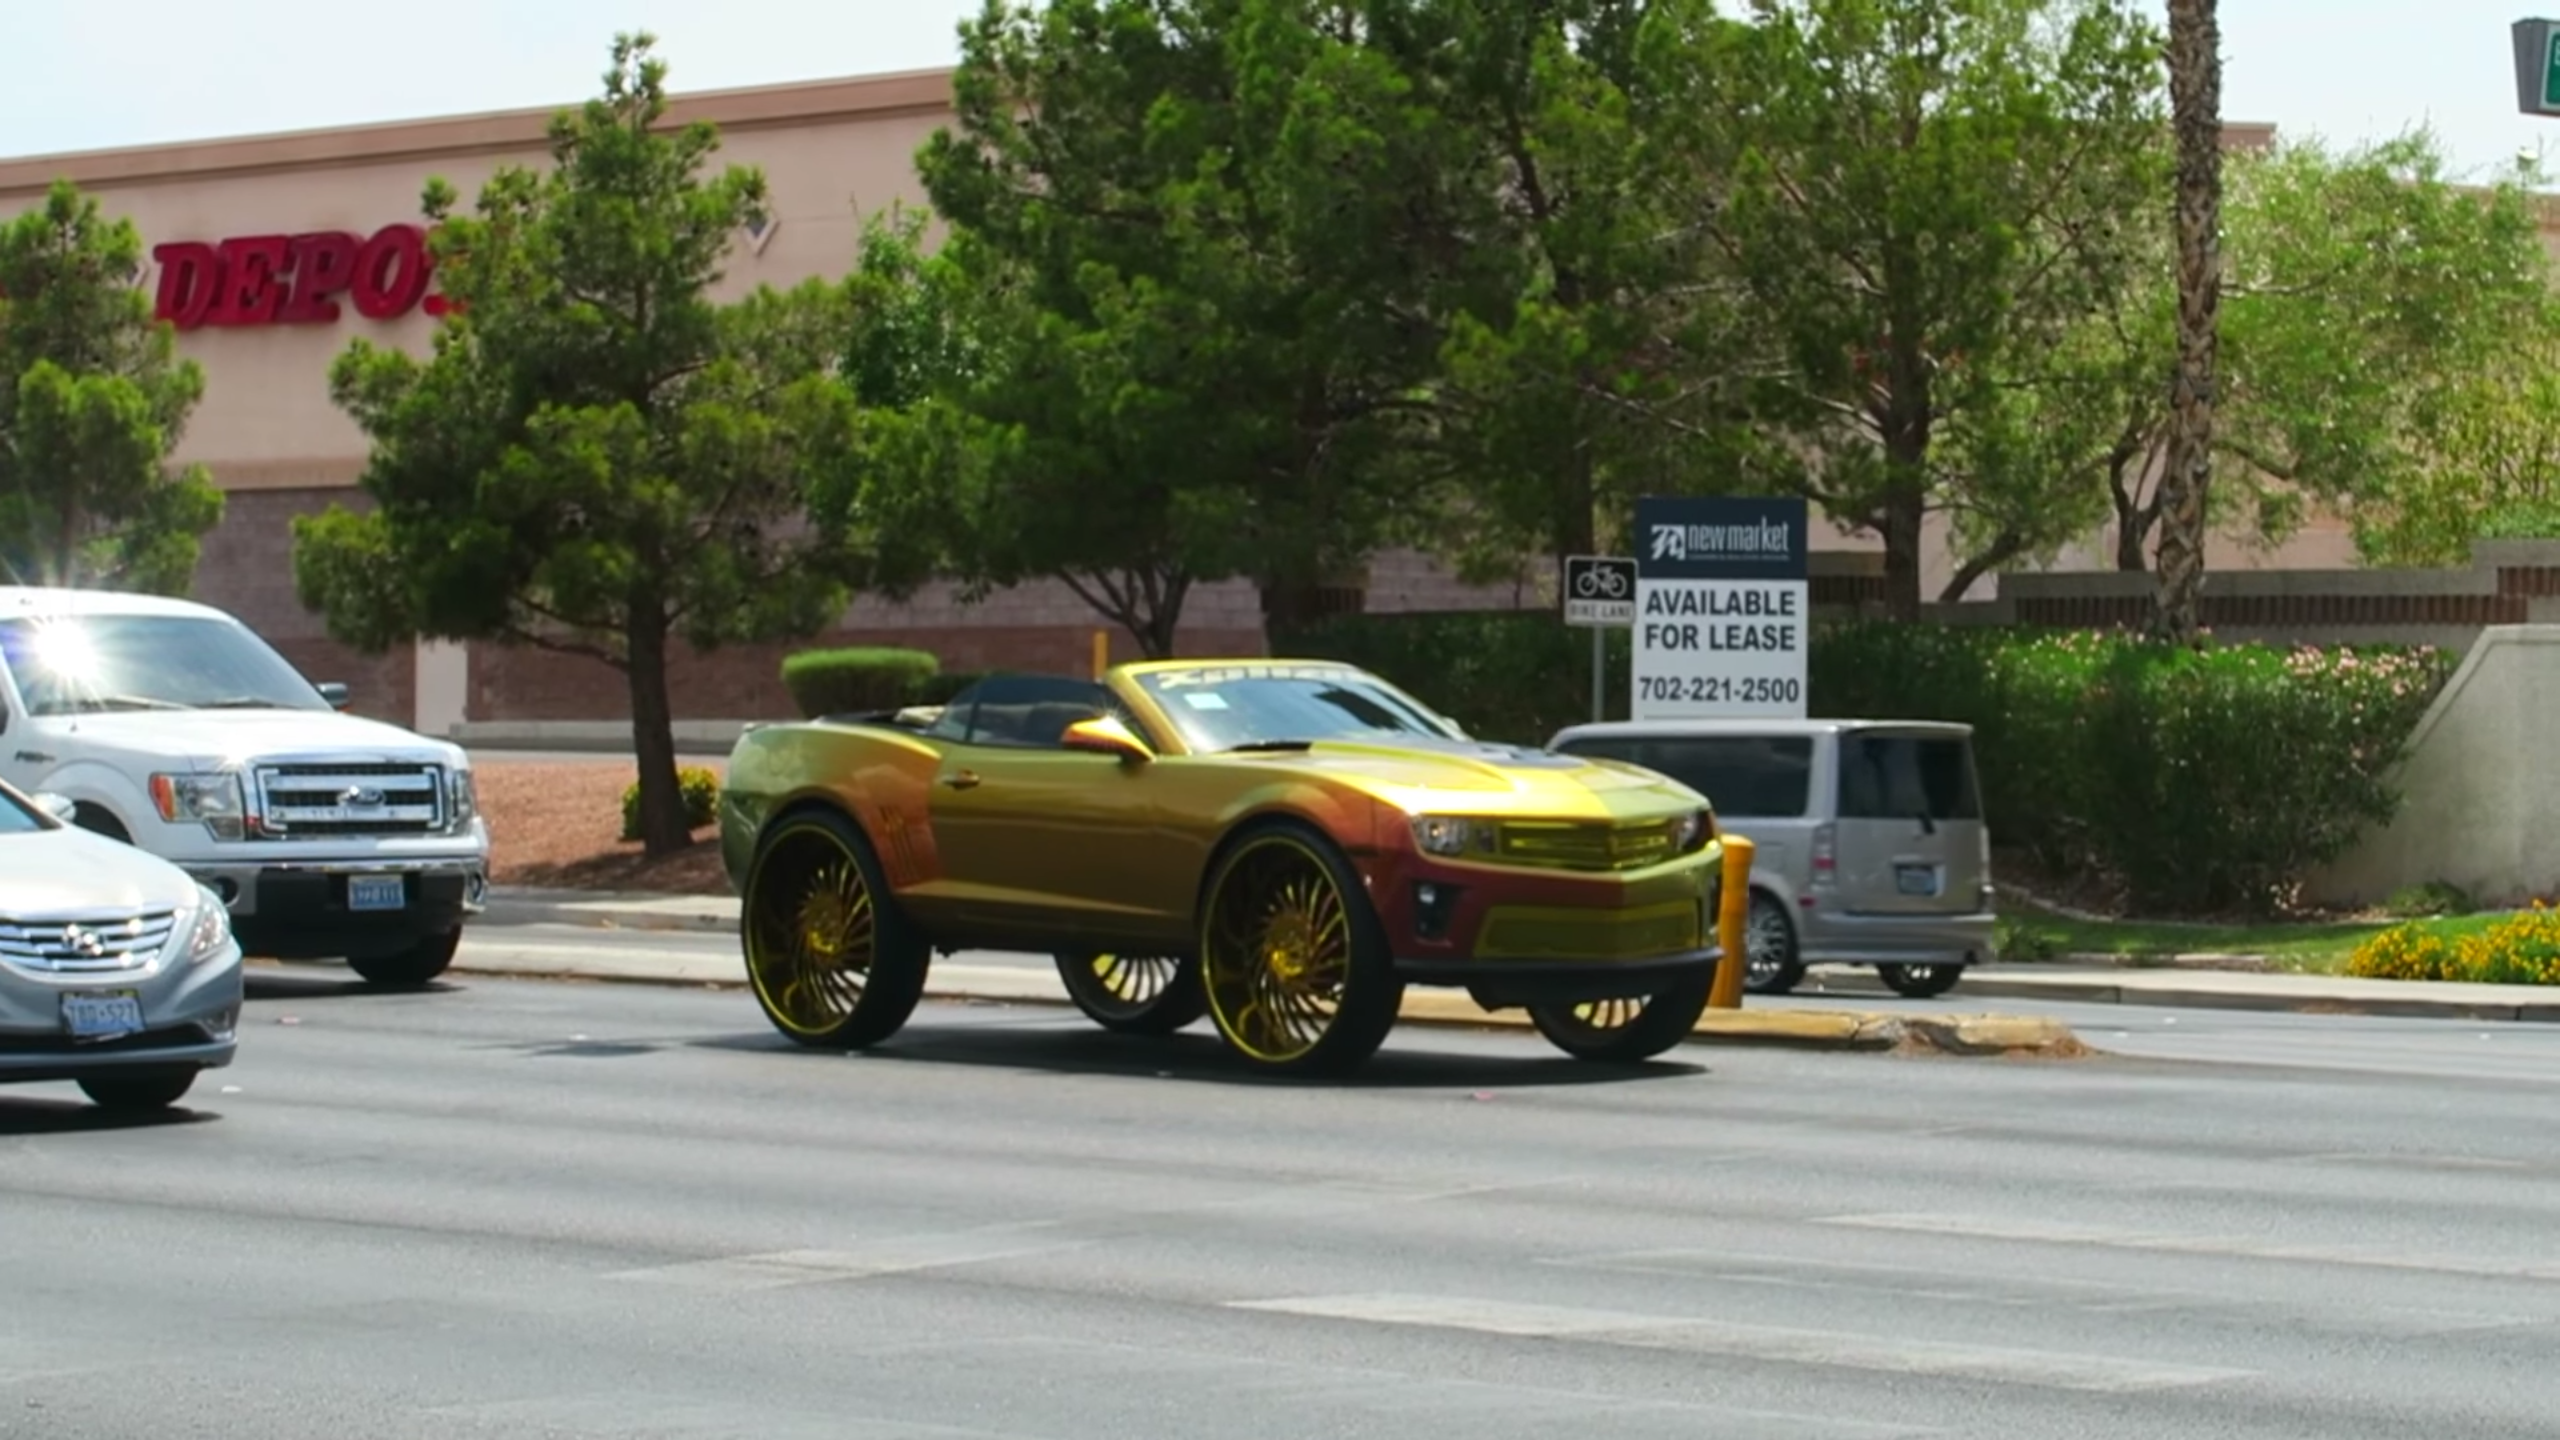 Dub car reinvent the wheel pinterest cars custom cars and dream cars